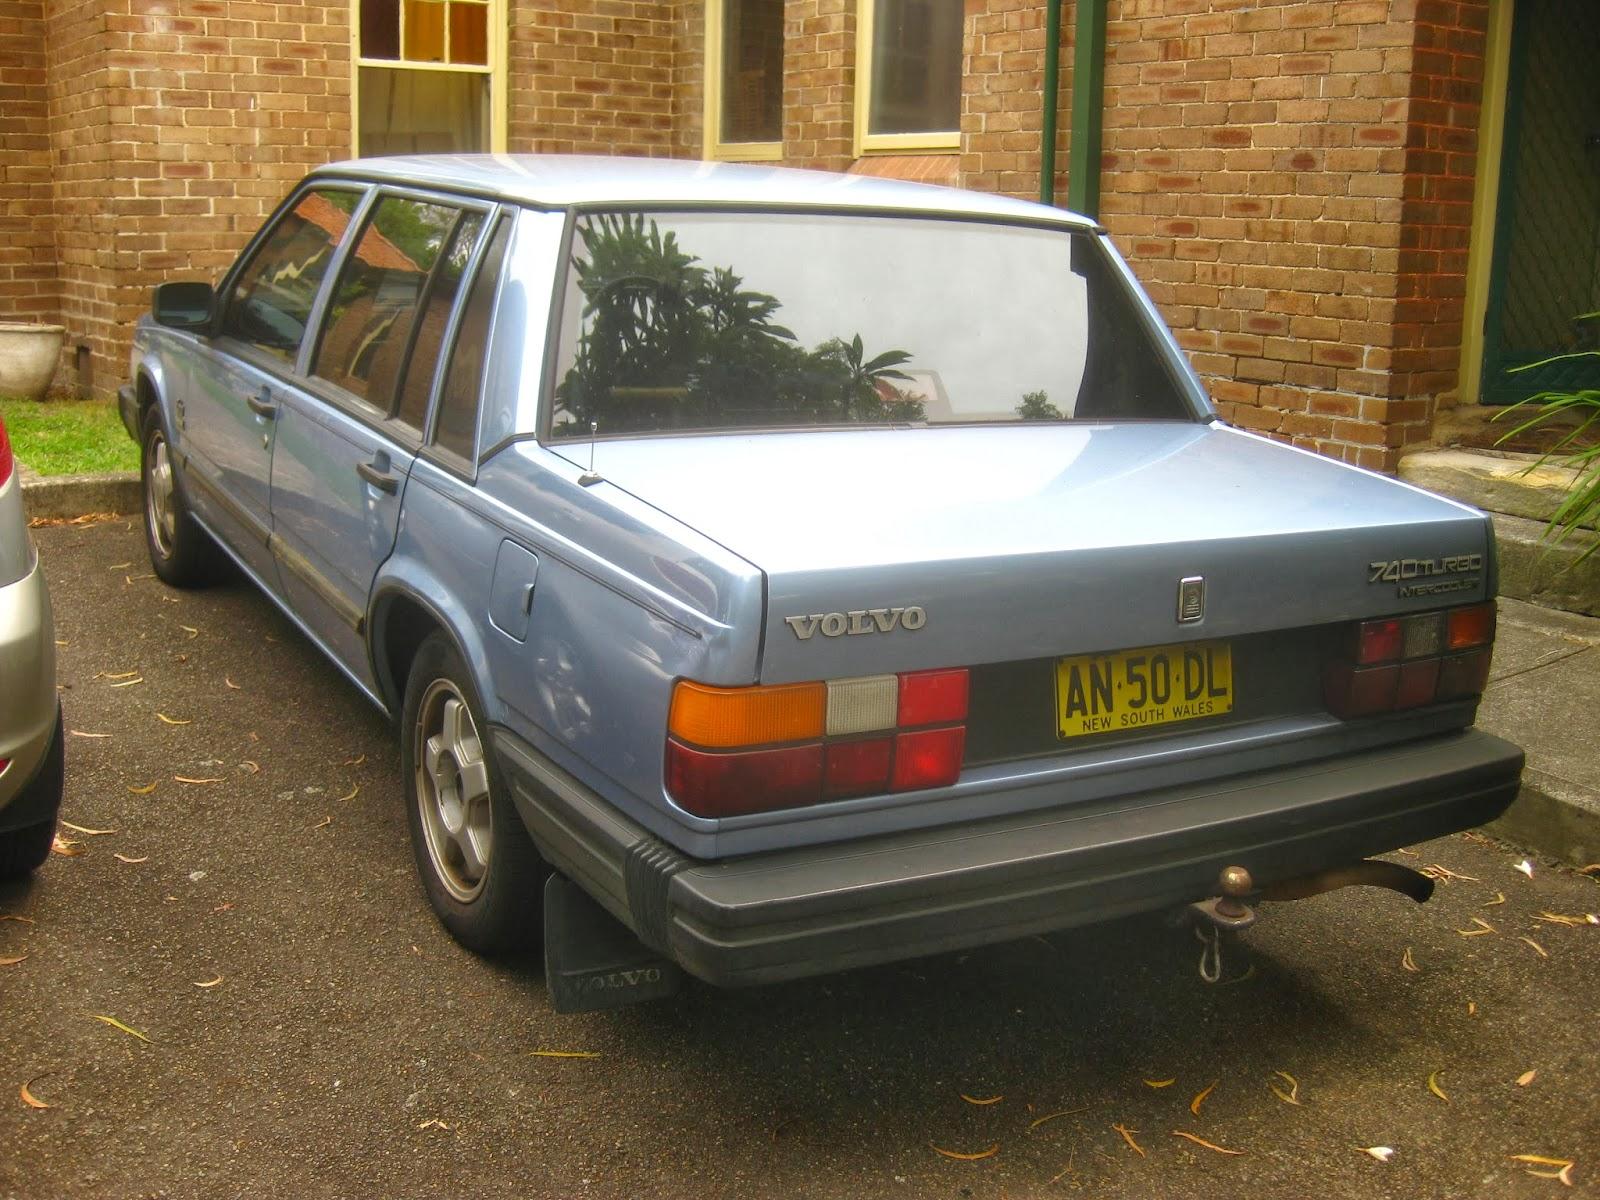 Aussie Old Parked Cars: 1987 Volvo 740 Turbo Sedan